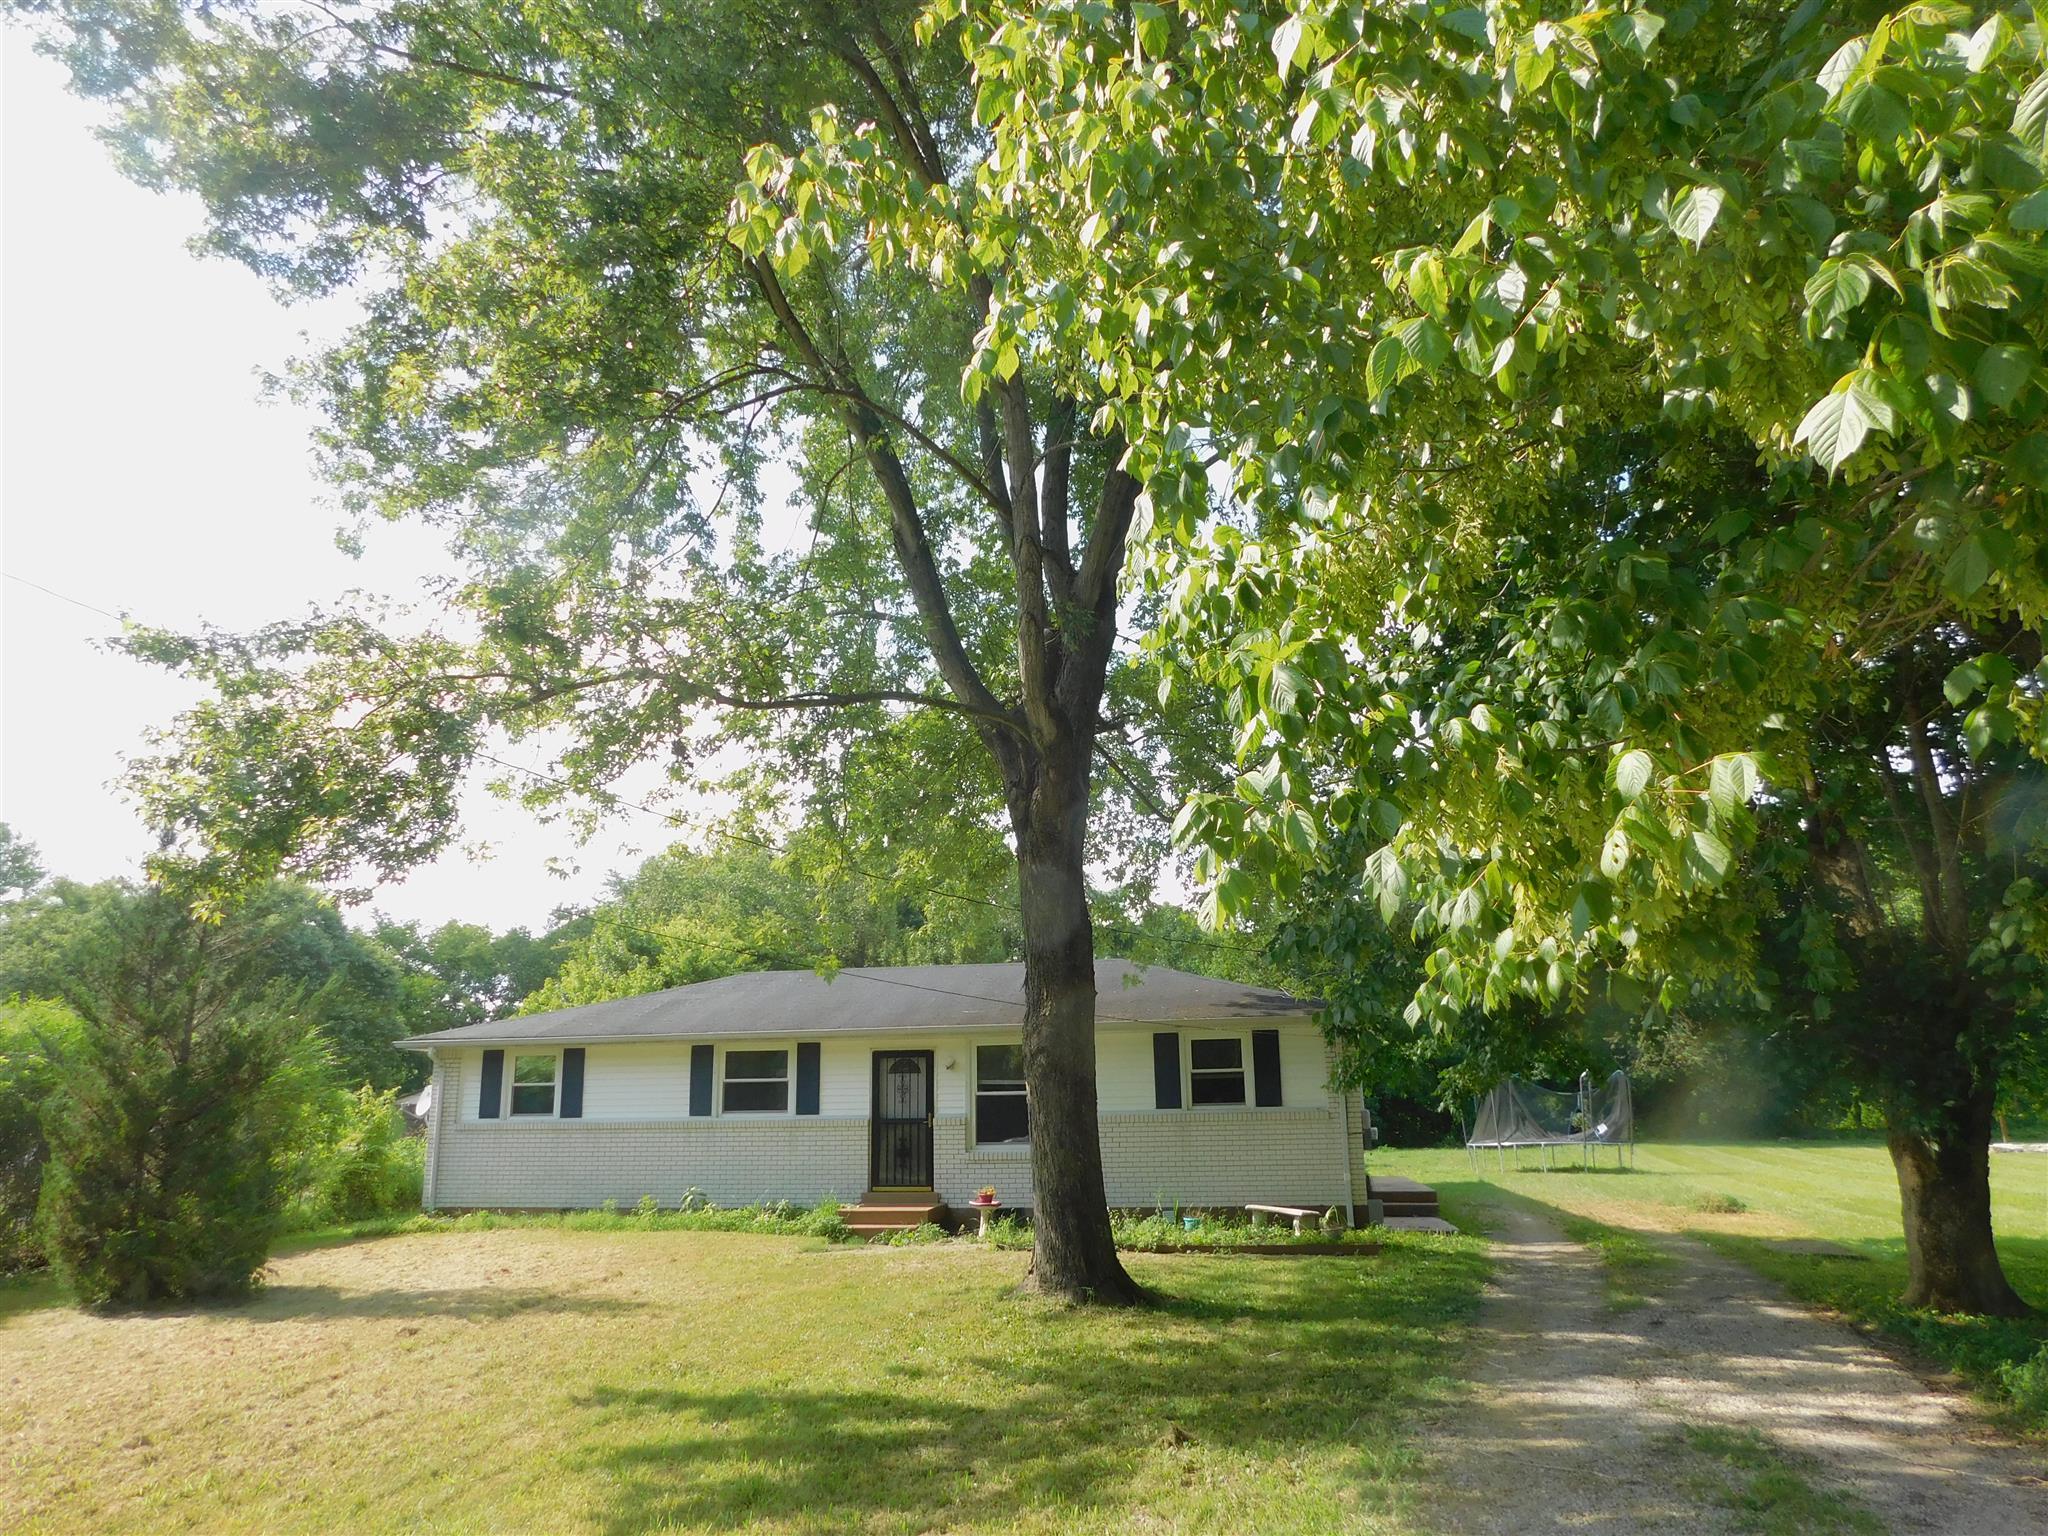 300 Sunset Blvd, Gallatin, TN 37066 - Gallatin, TN real estate listing